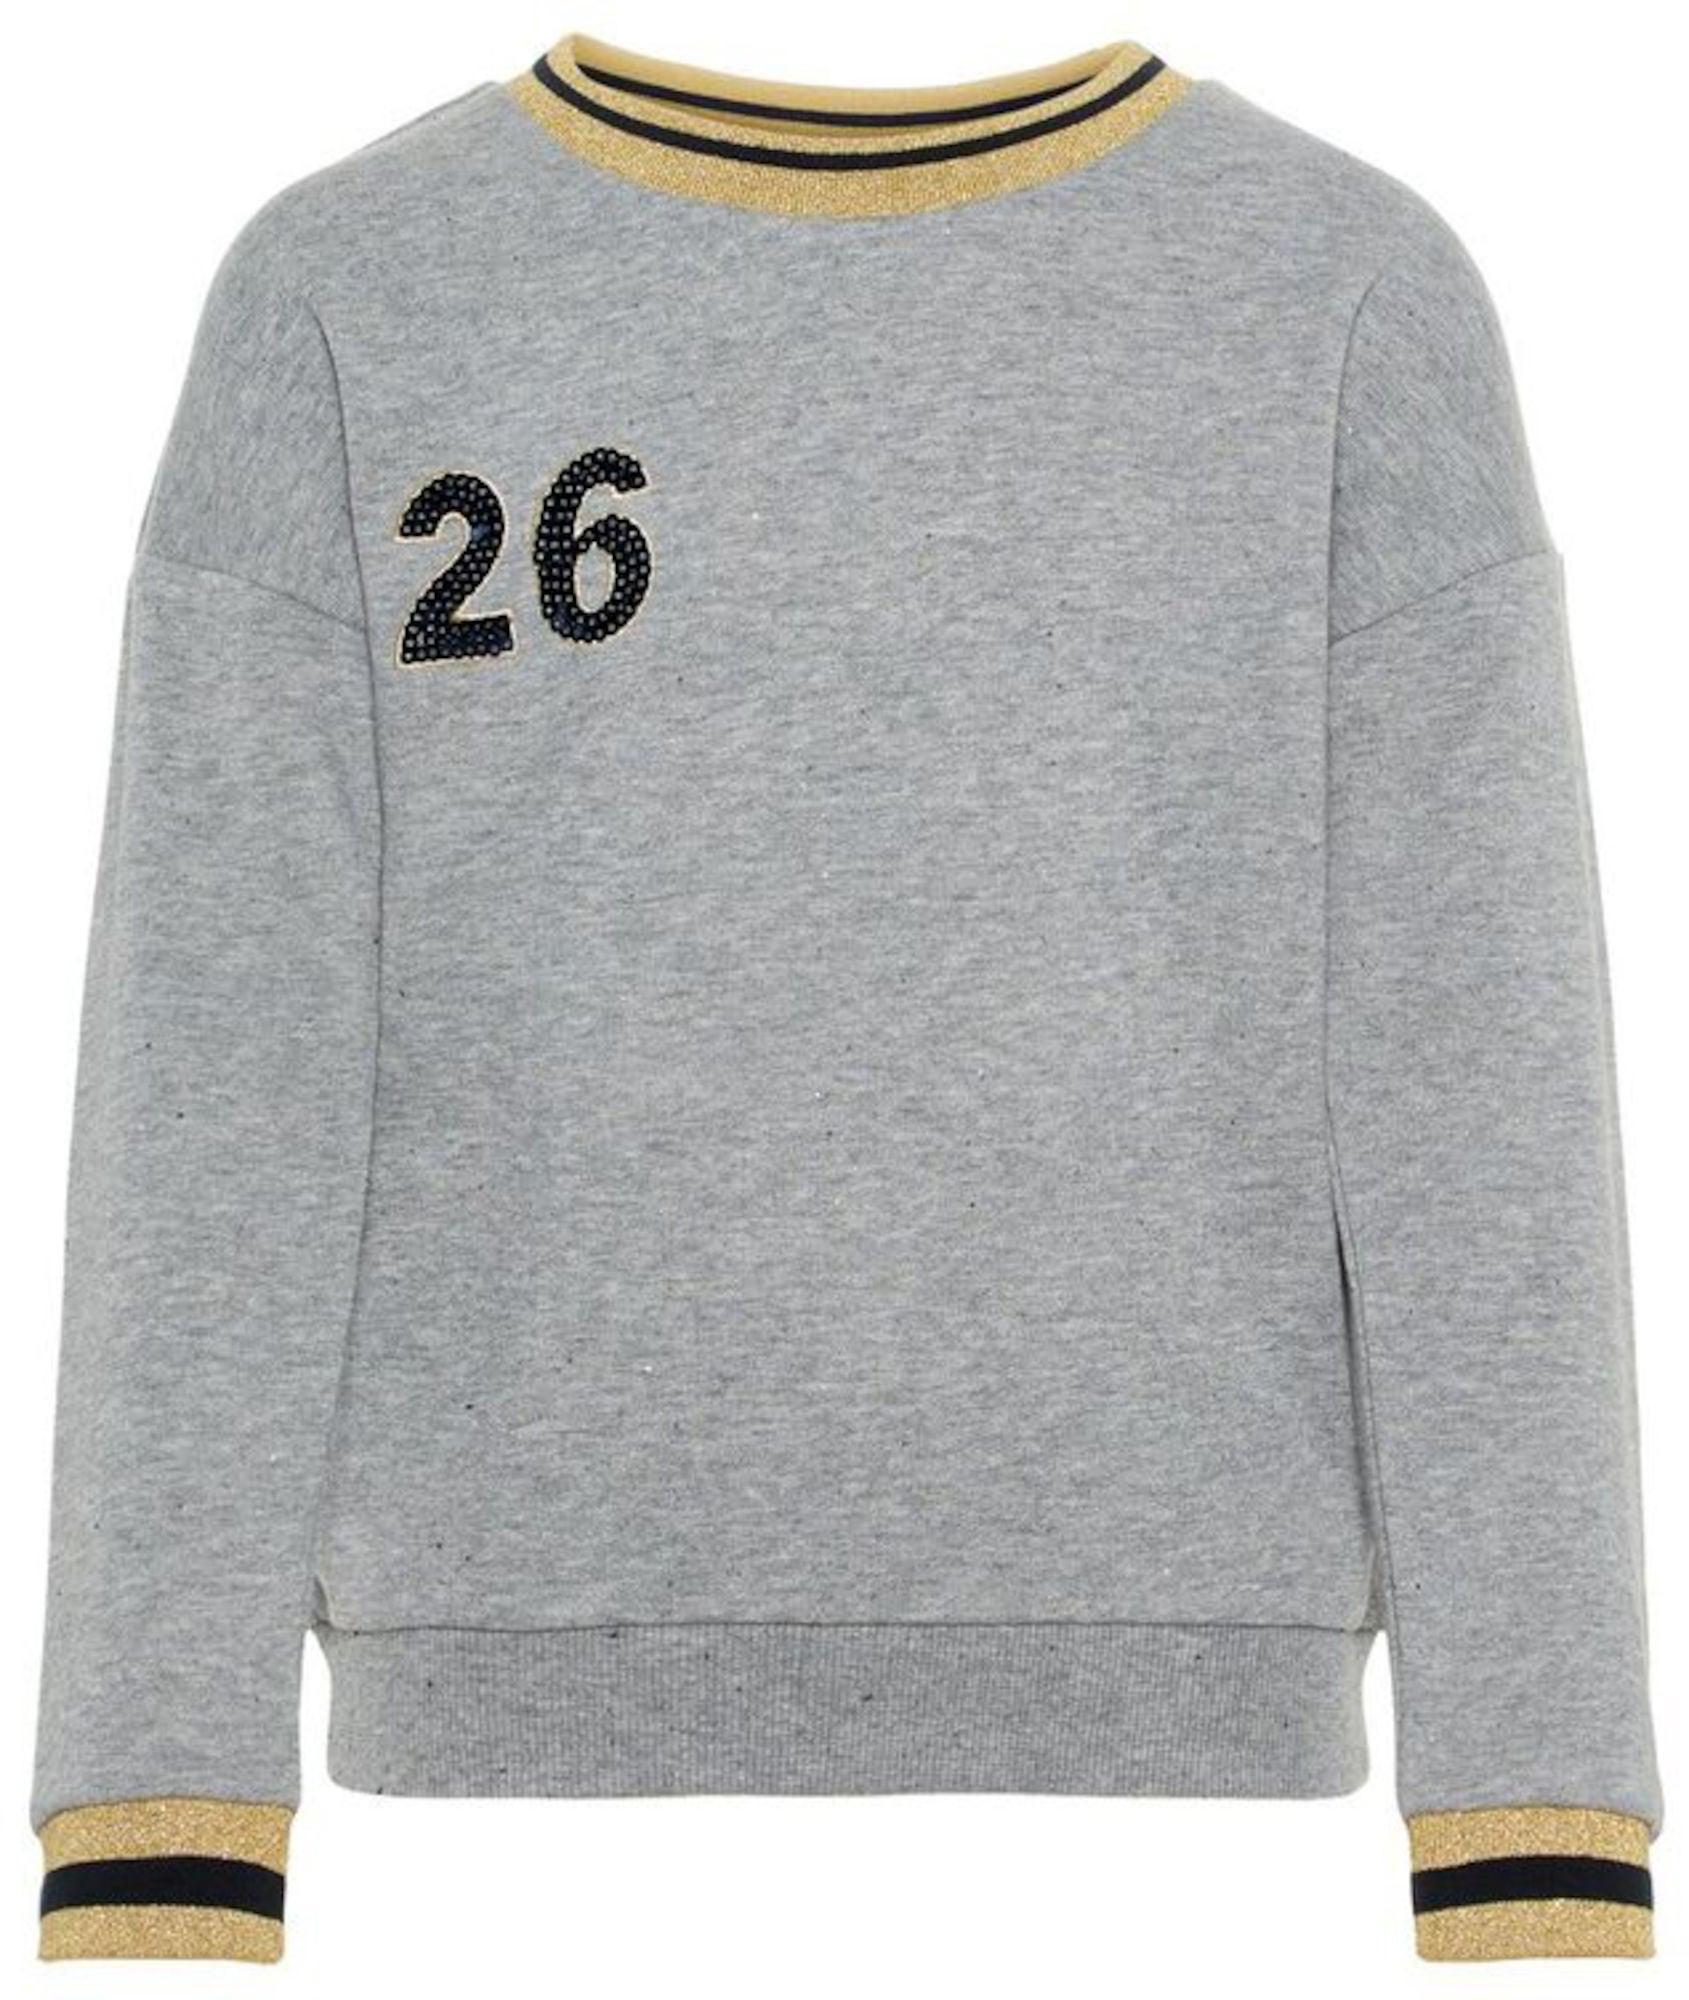 Name it Sweatshirt, Grey Melange 122/128